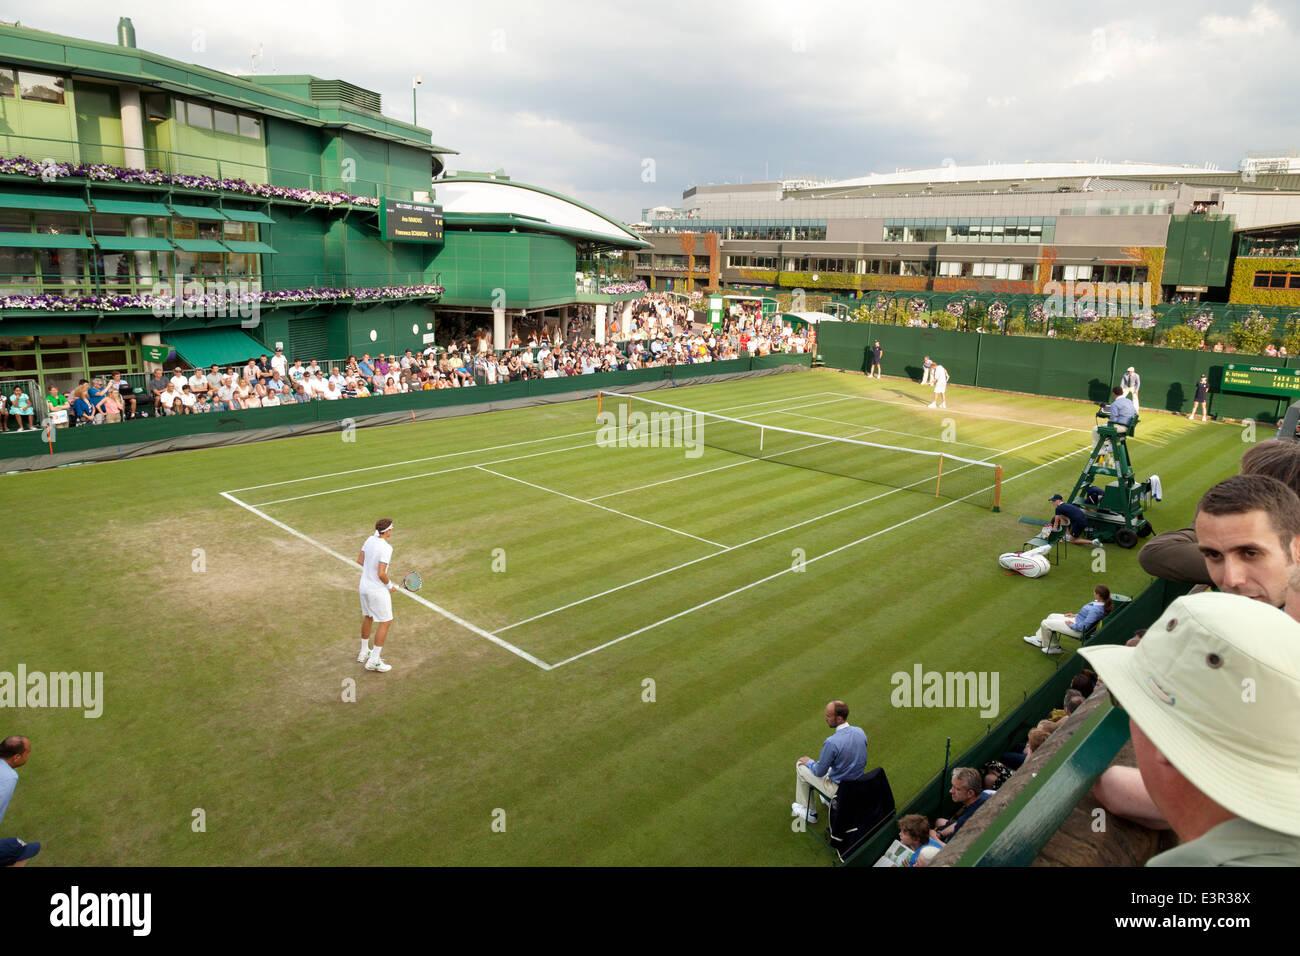 Tennis match on an outside court, the Wimbledon All England Lawn Tennis Club Championships, Wimbledon London UK - Stock Image